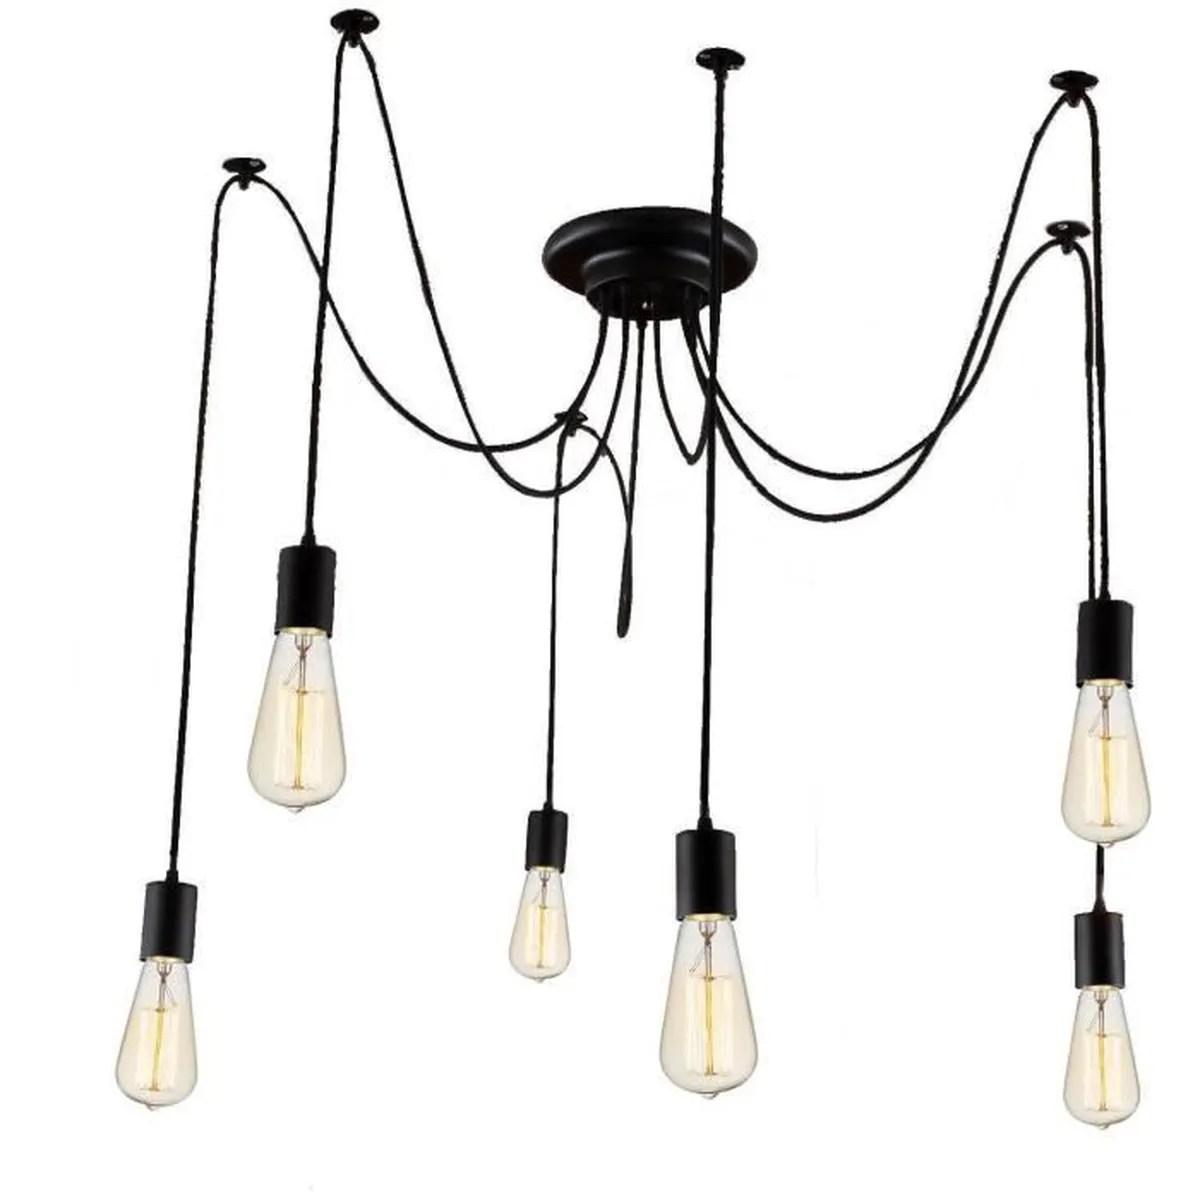 6 Tetes E27 Retro Vintage Diy Lustre Plafonnier Luminaires